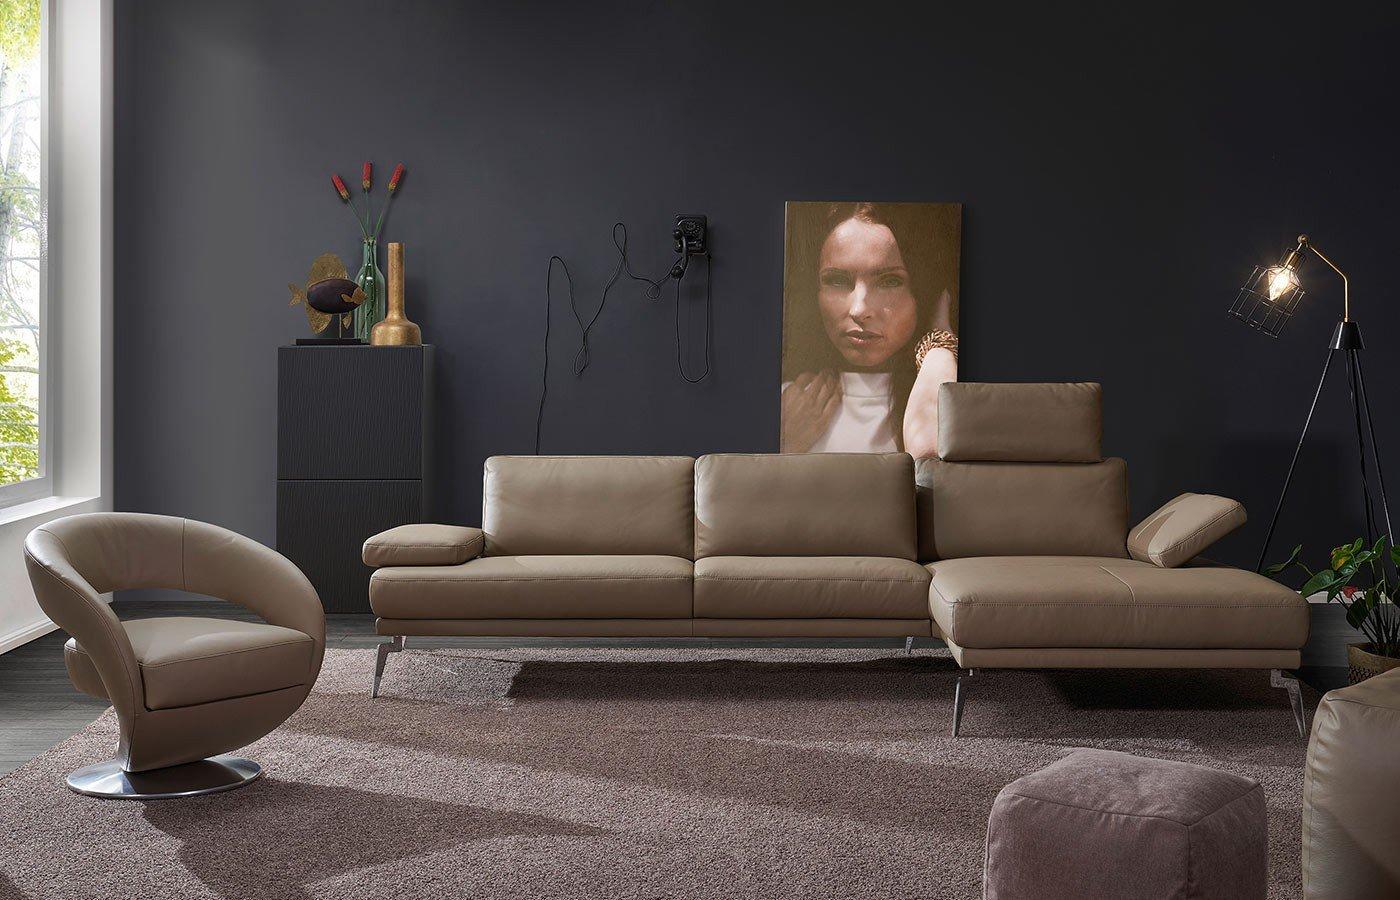 k w polsterm bel ontario 7283 polstergarnitur in beige m bel letz ihr online shop. Black Bedroom Furniture Sets. Home Design Ideas